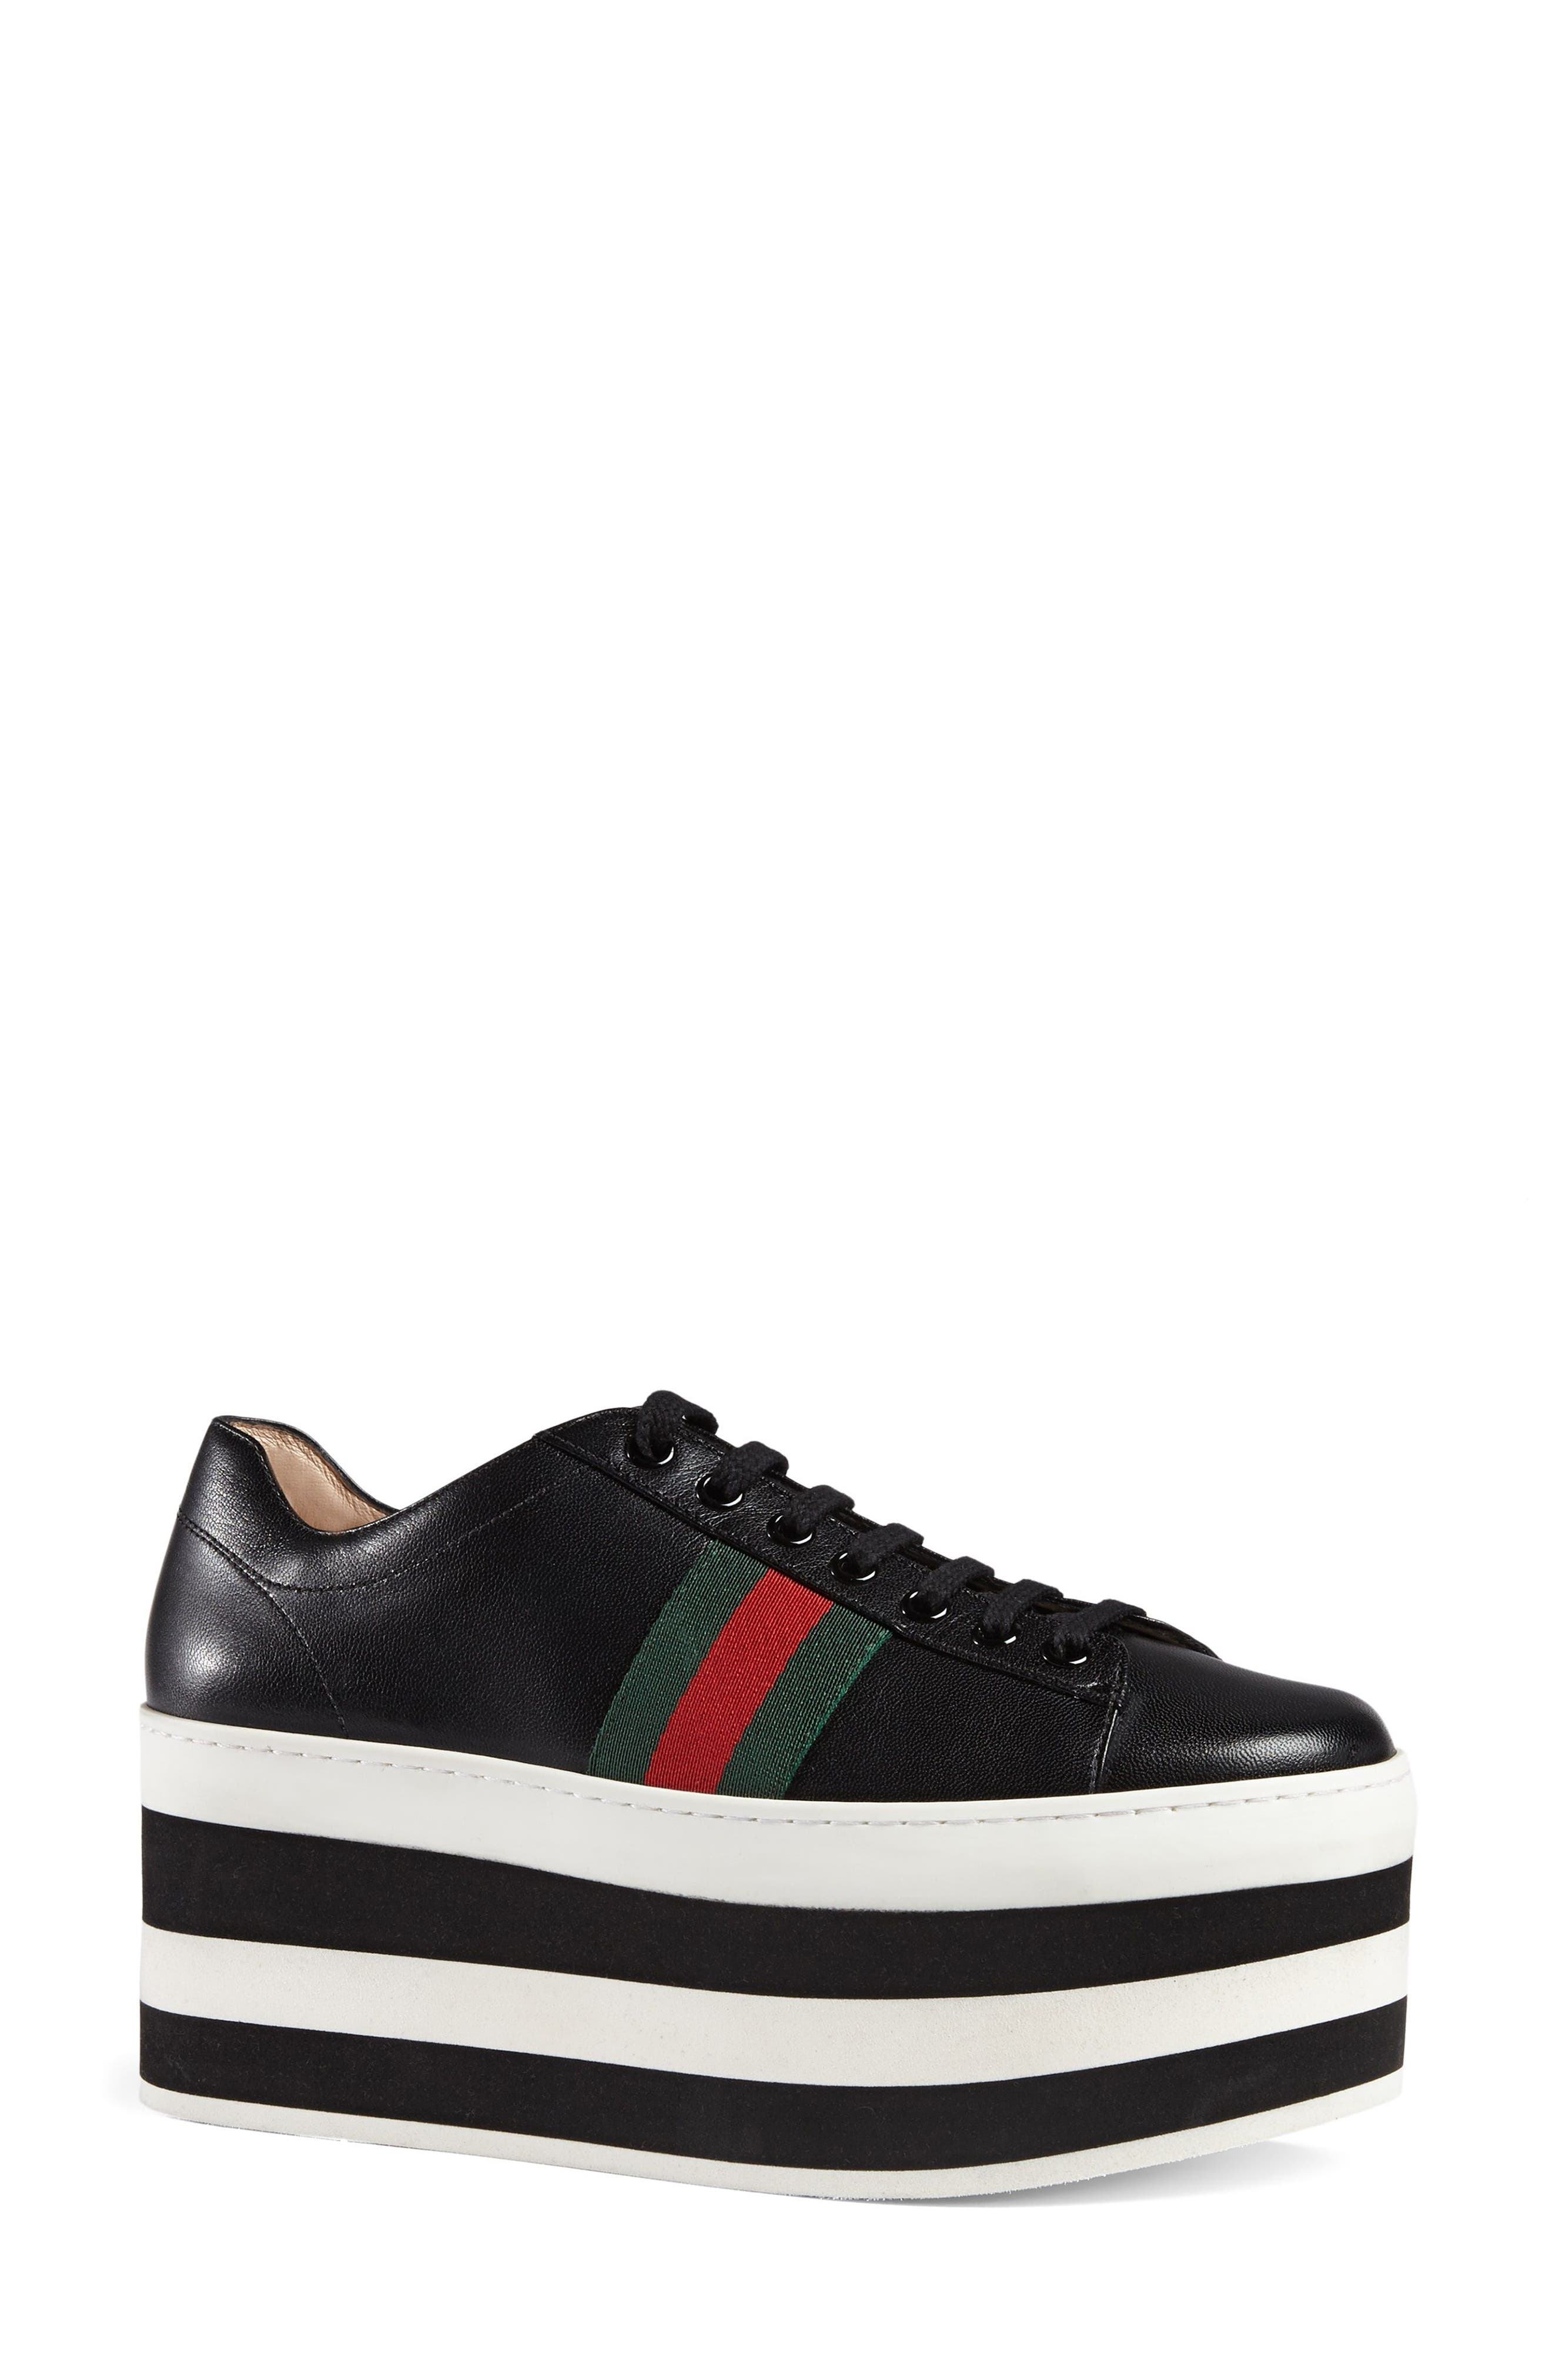 Peggy Flatform Sneaker,                             Alternate thumbnail 3, color,                             001